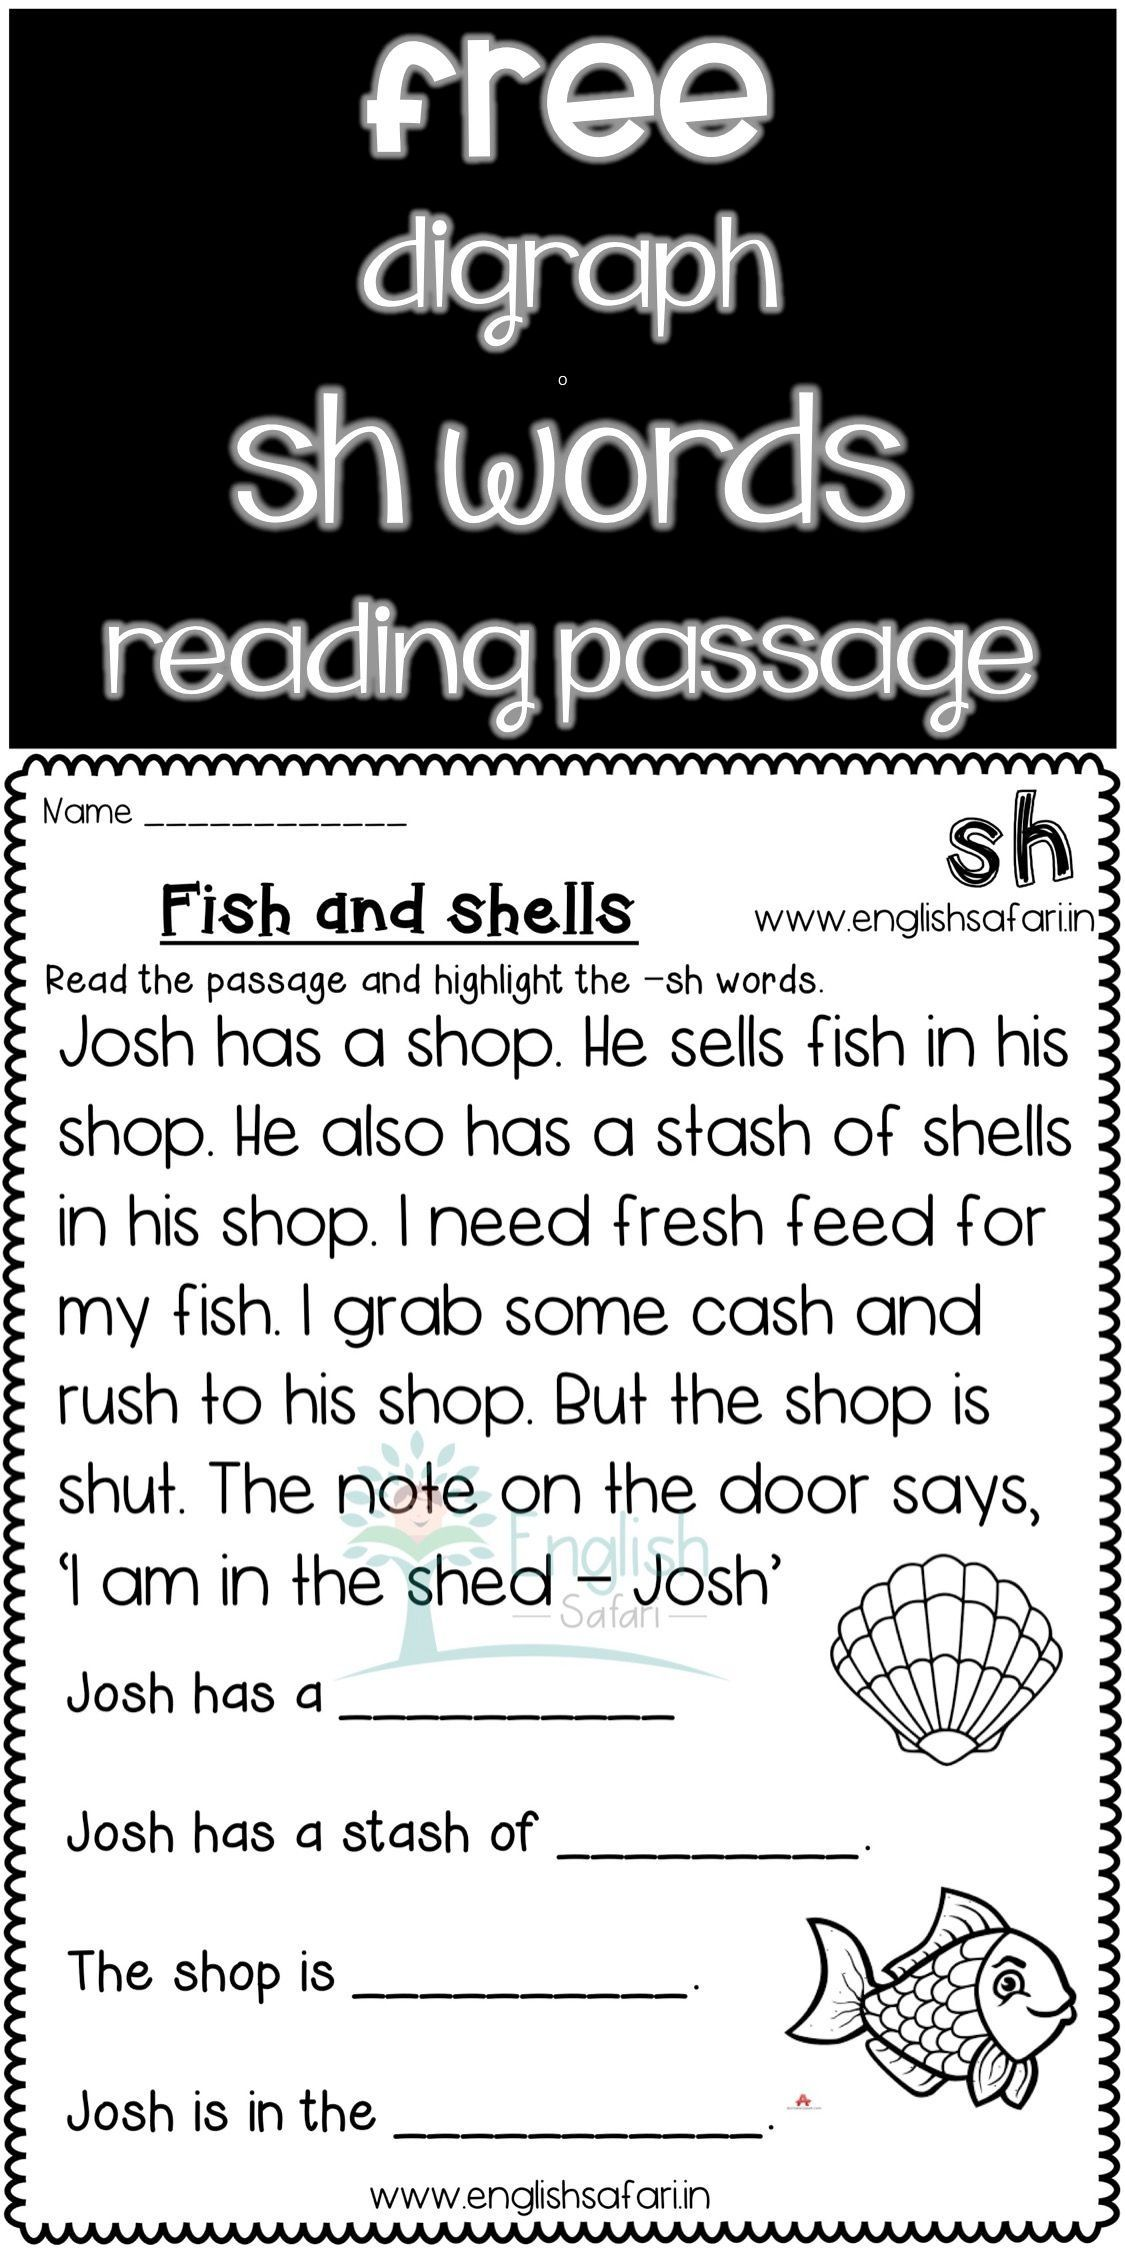 hight resolution of FREE** sh words reading comprehension www.worksheetsenglish.com   Phonics  reading